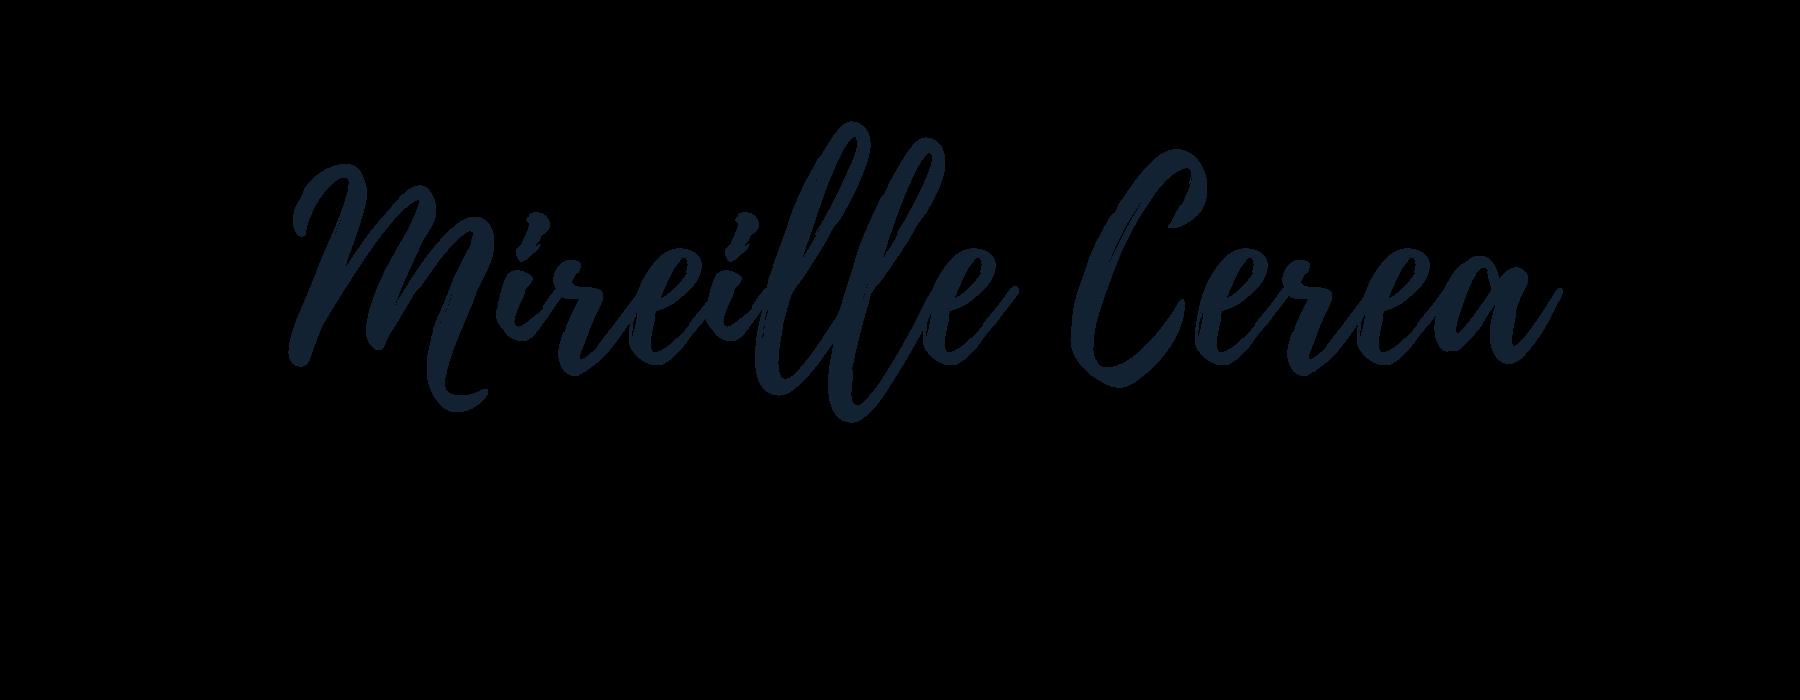 Nom de l'artiste Mireille Cerea